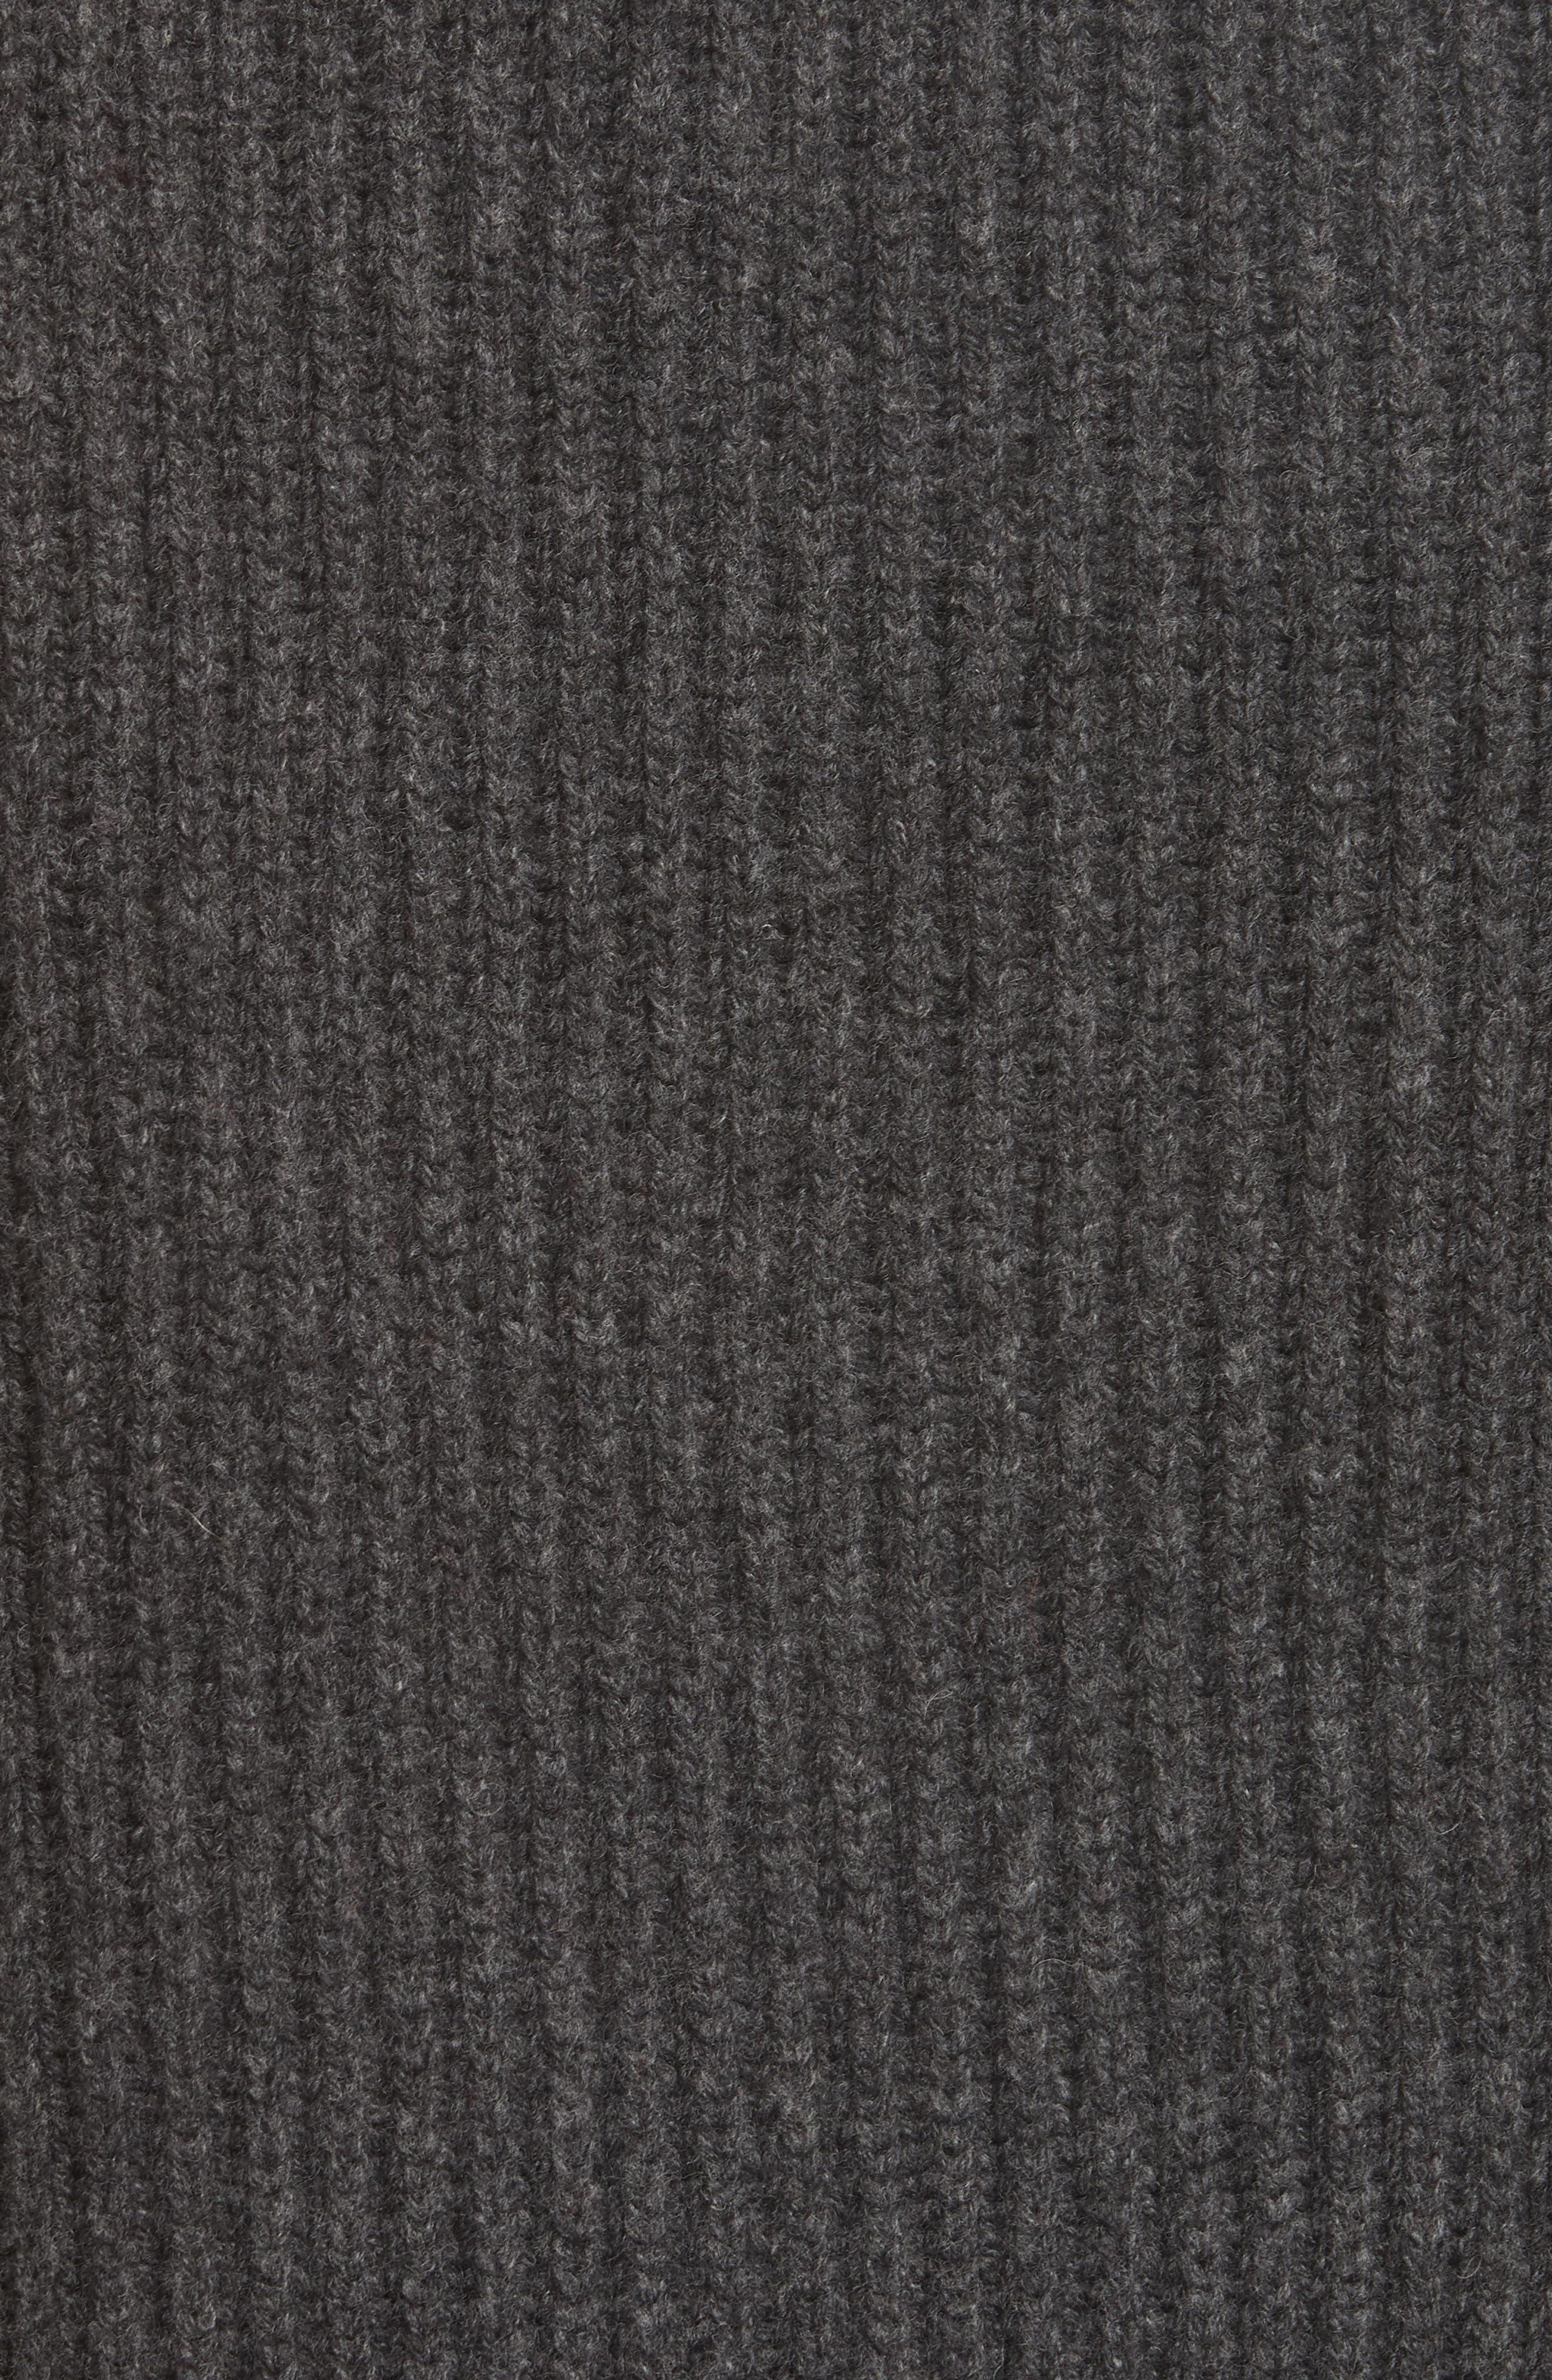 Ribbed Oversized Sweater,                             Alternate thumbnail 5, color,                             DARK GREY